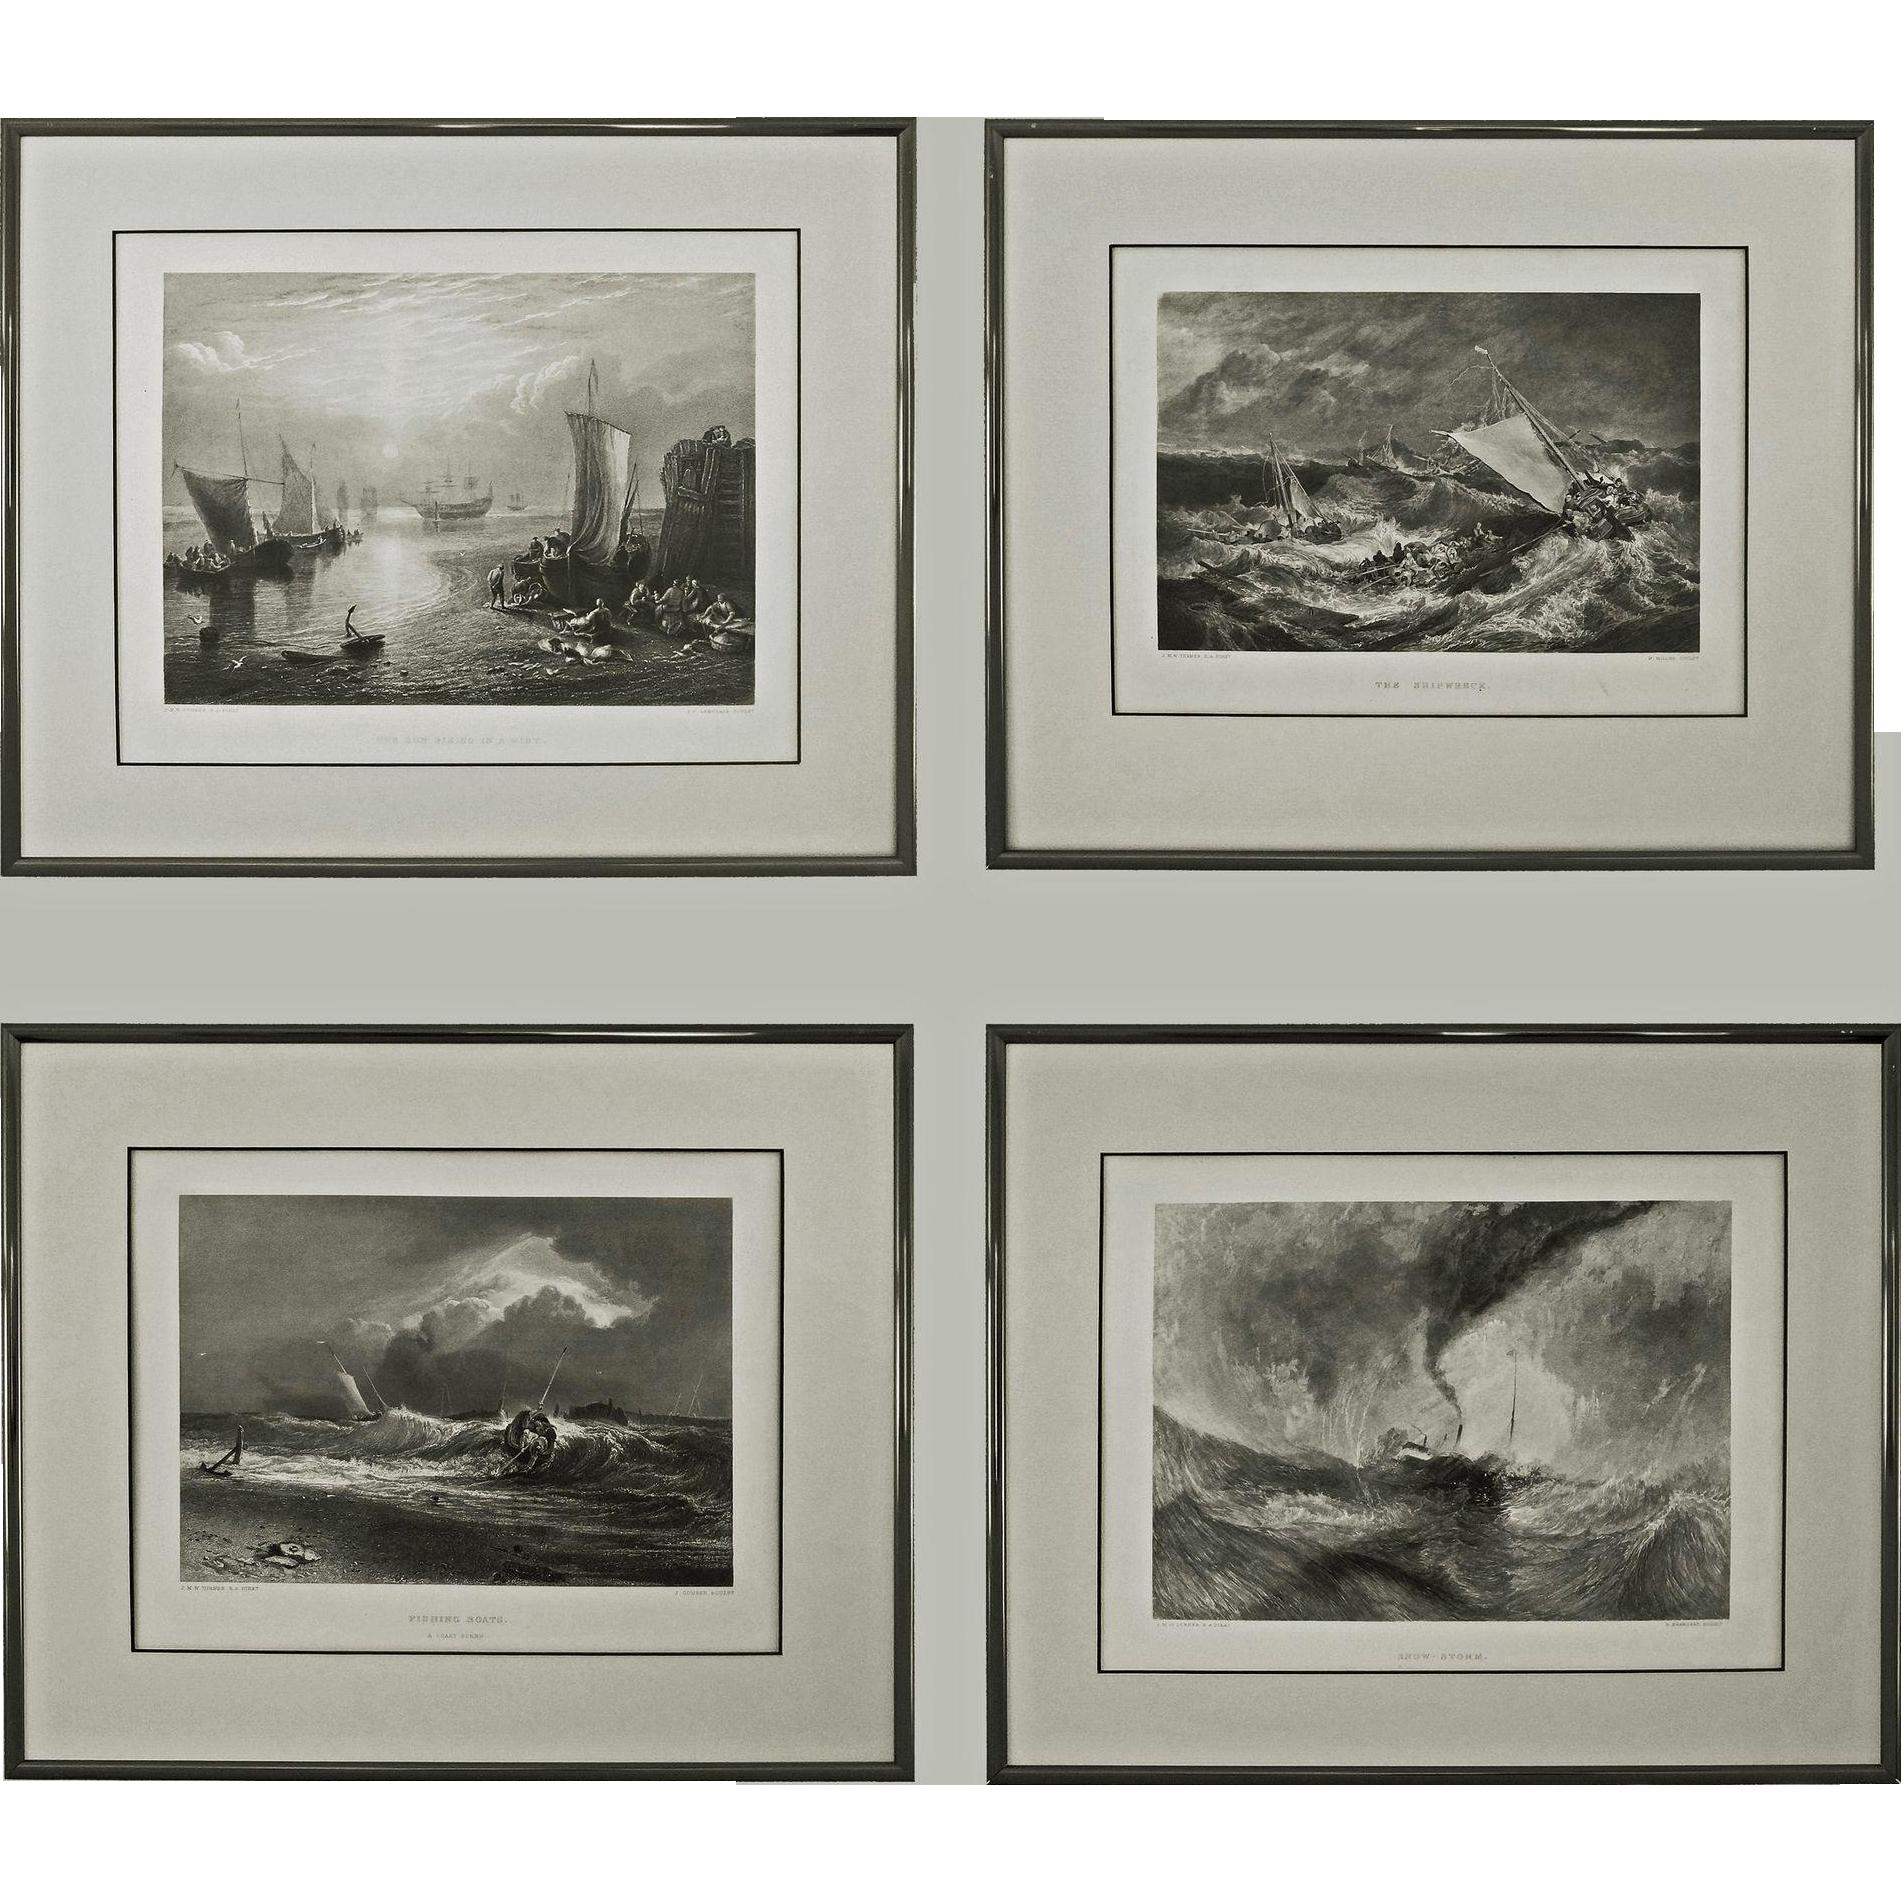 Set 4 Turner Maritime Nautical Engravings - c. 19th Century, England